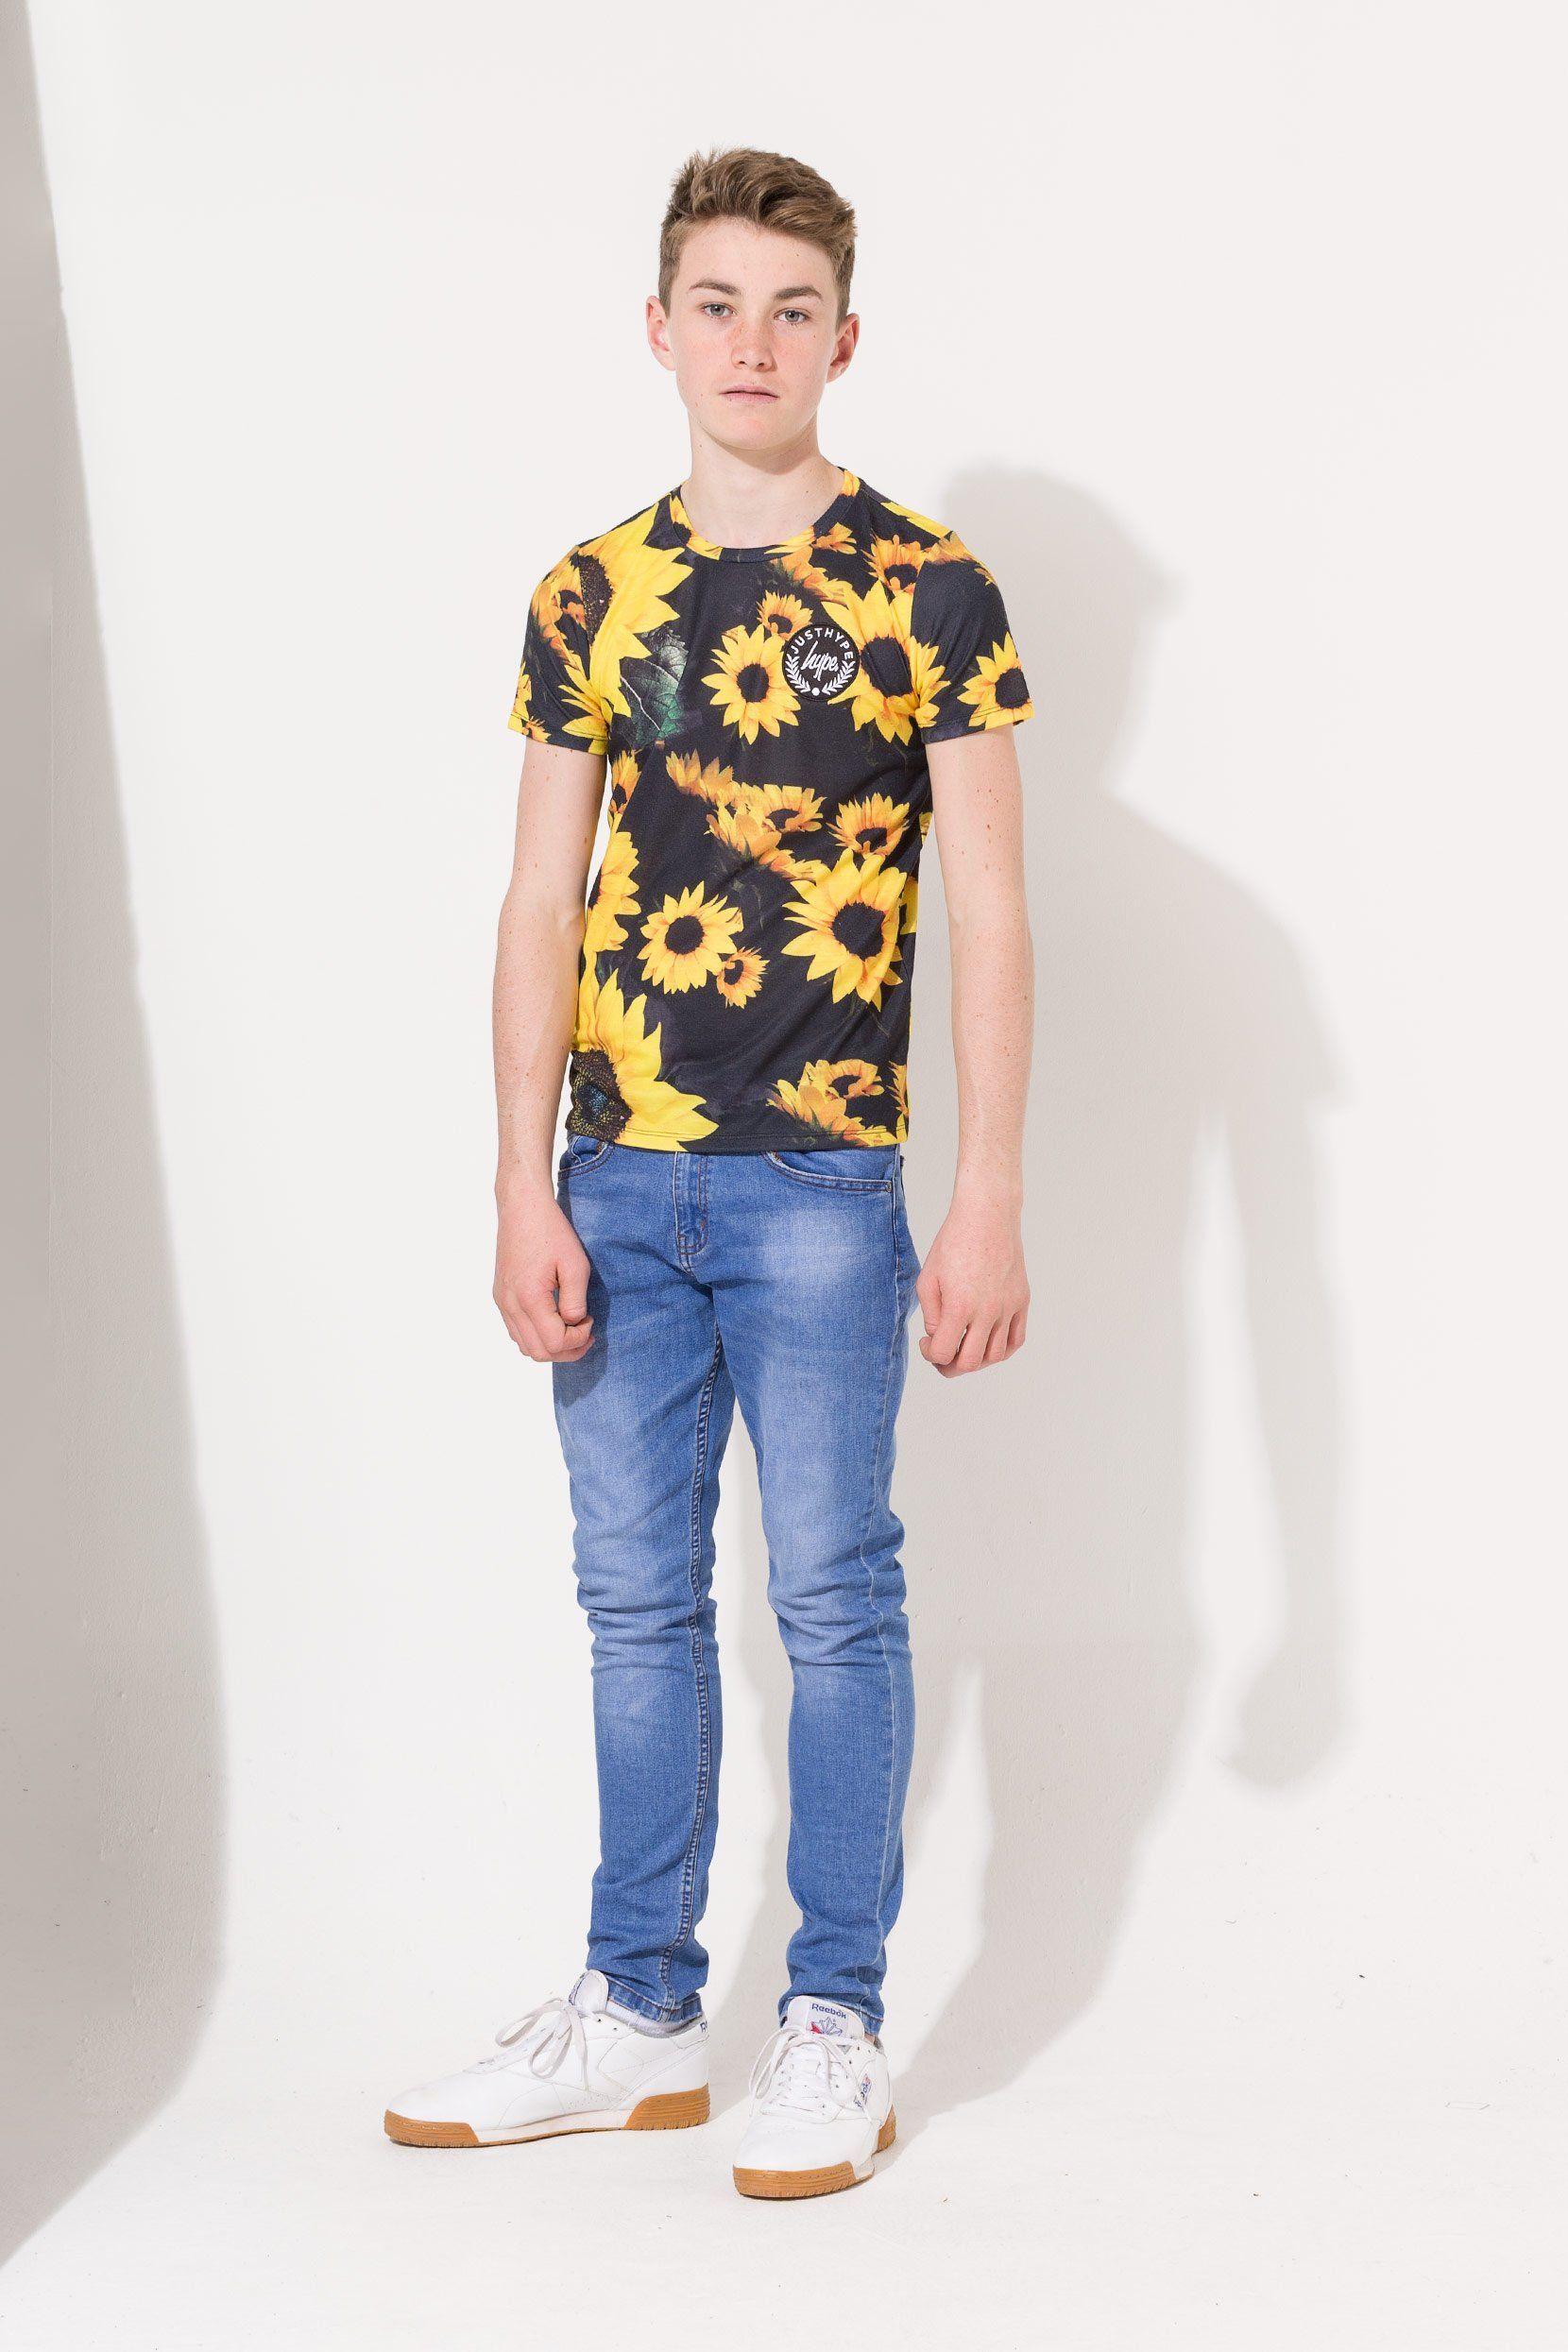 Hype Black Sunflower Crest Kids T-Shirt 13Y